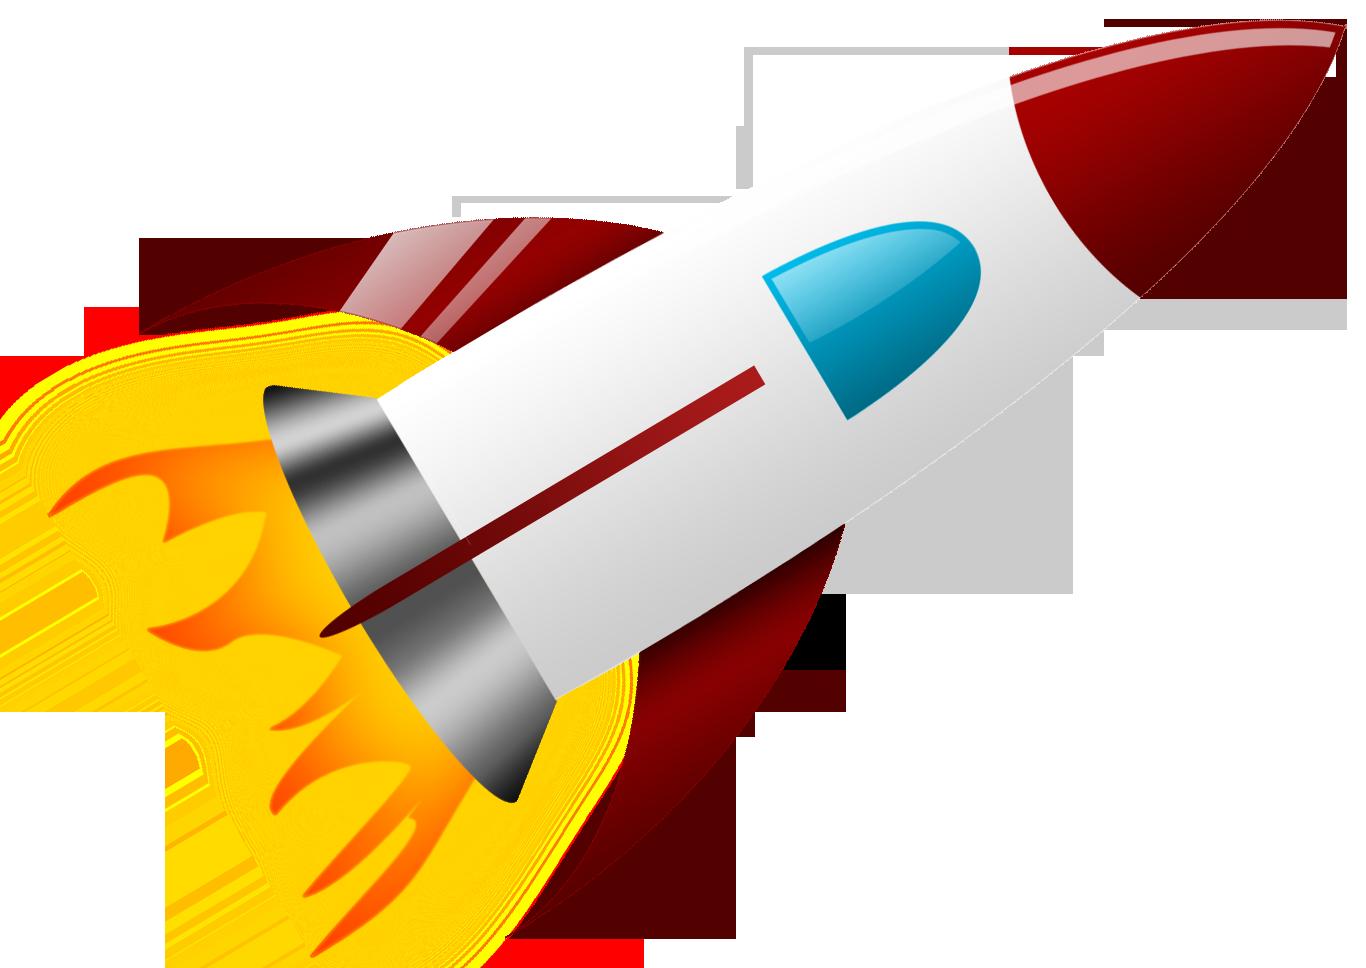 Clipart Rocket PNG Image.